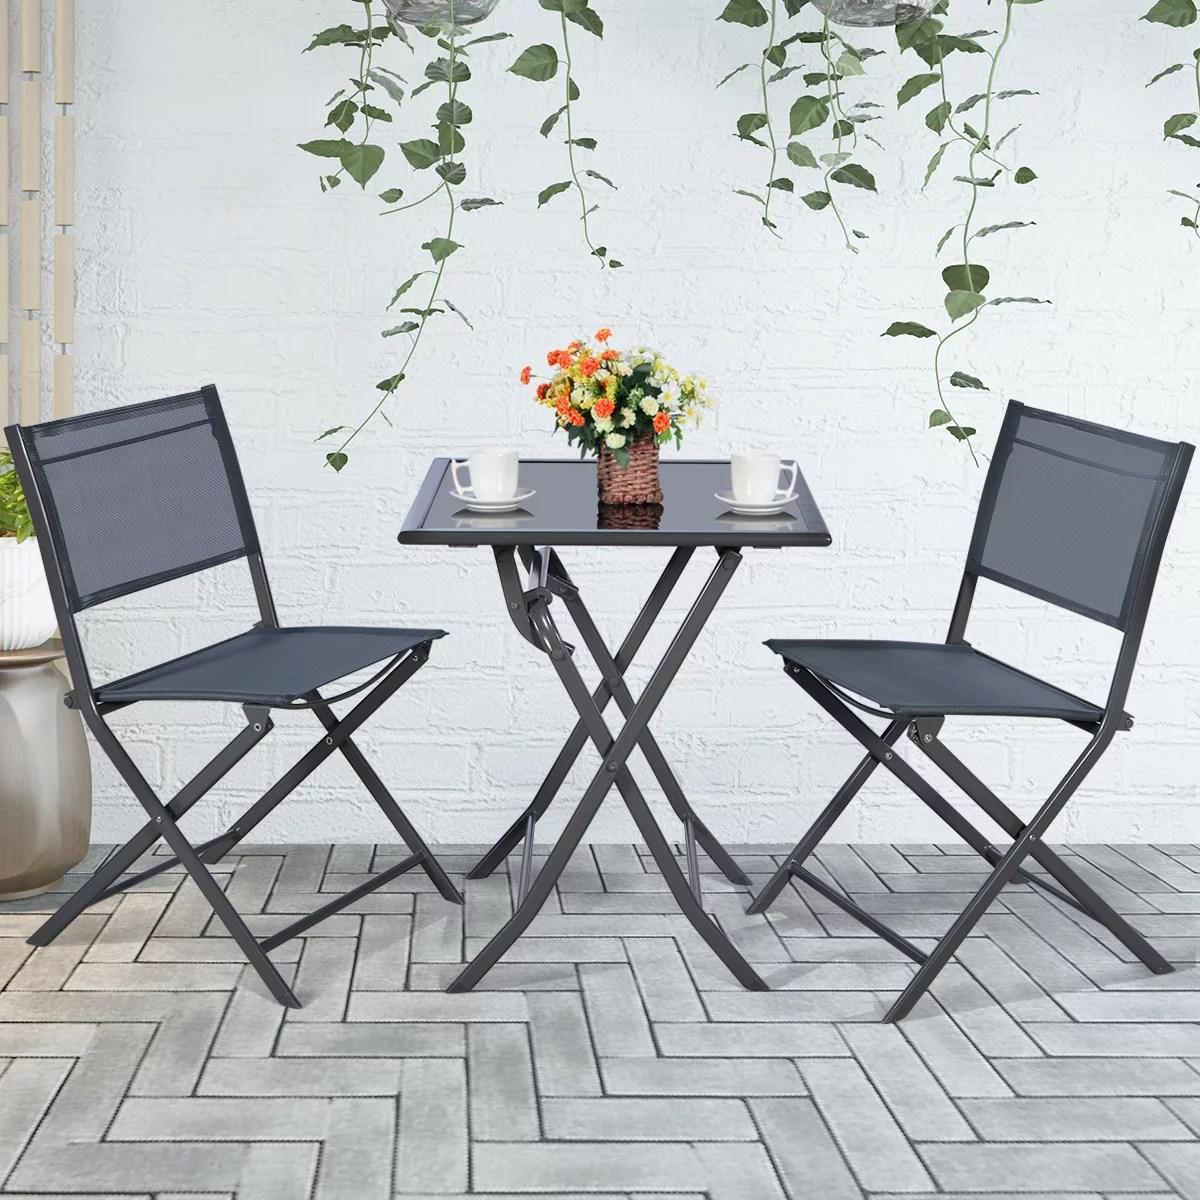 3pcs bistro set garden backyard table chairs outdoor patio furniture folding